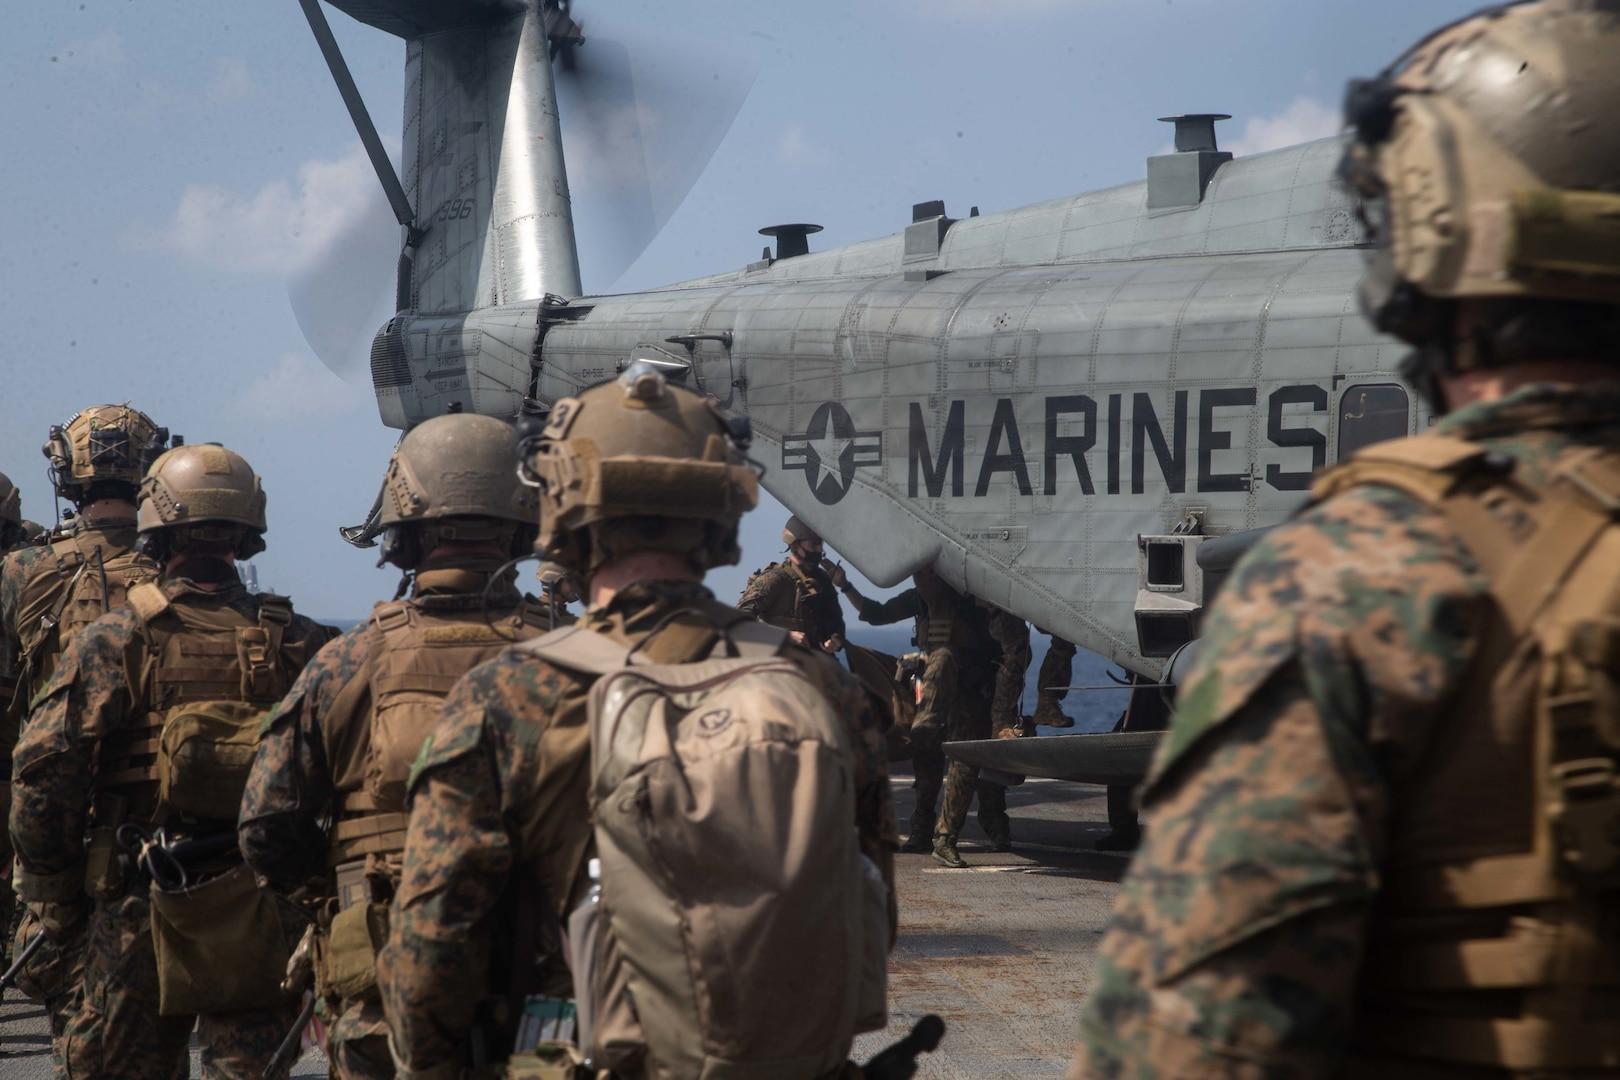 31st MEU, America ARG conduct VBSS rehearsal in South China Sea